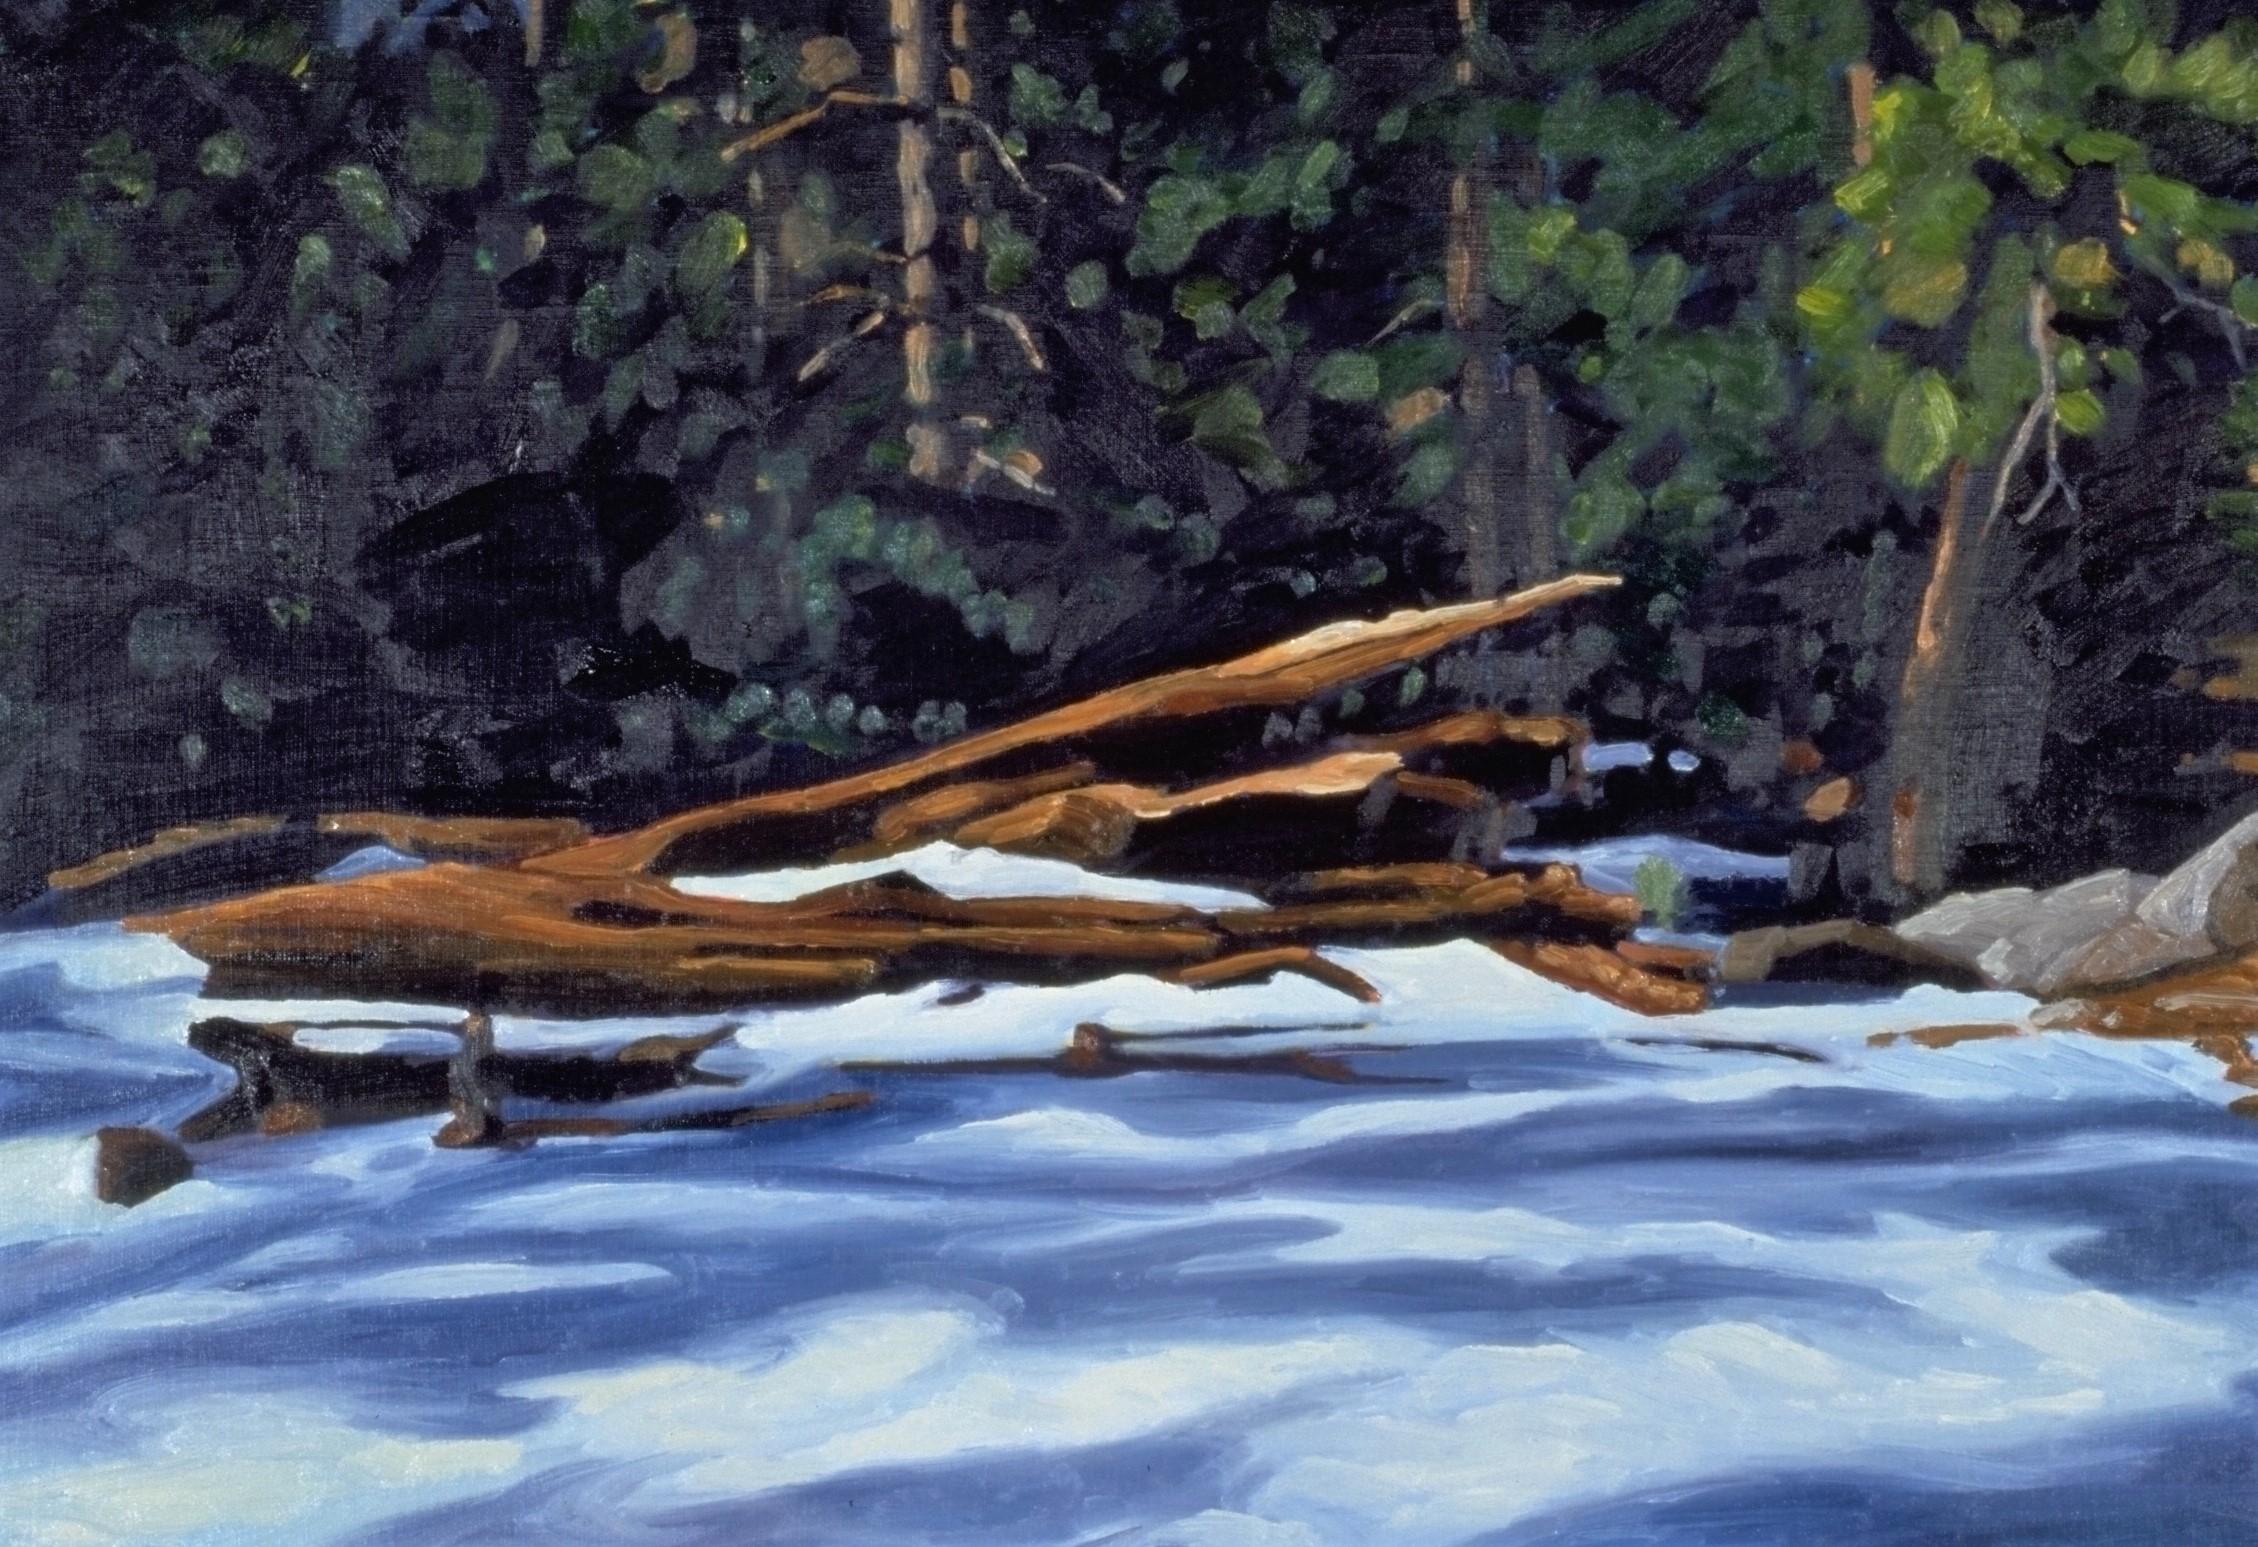 Winter Hike, Idyllwild, CA  16x20  Oil on Panel  2000